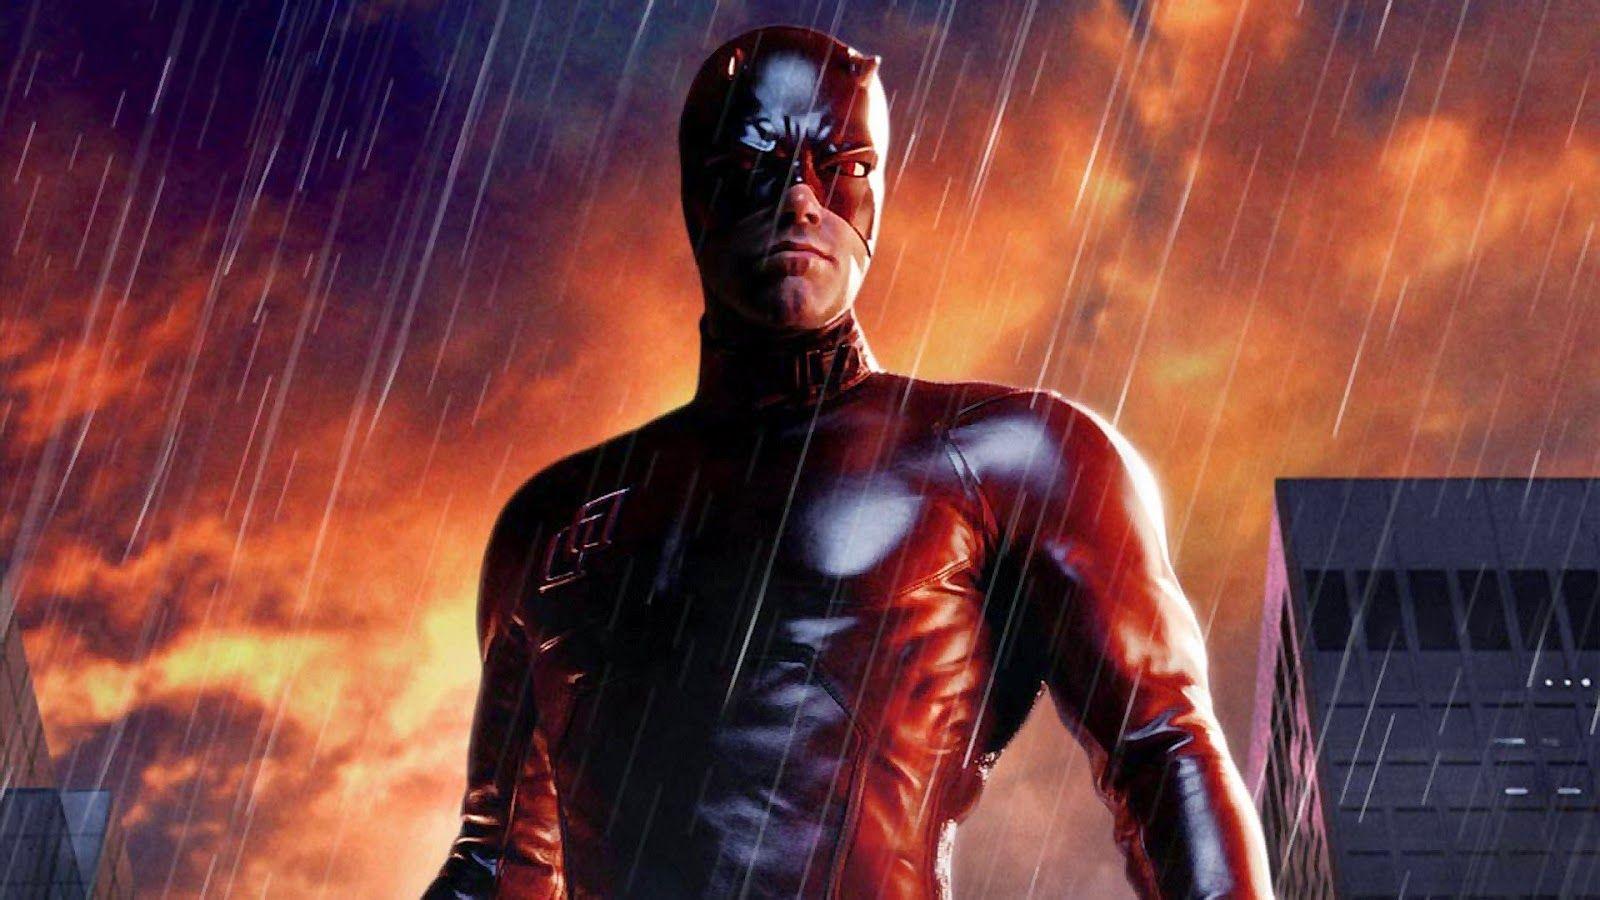 Daredevil Netflix HD Wallpapers | HD Wallpapers News | Daredevil, Super hero costumes, Superhero